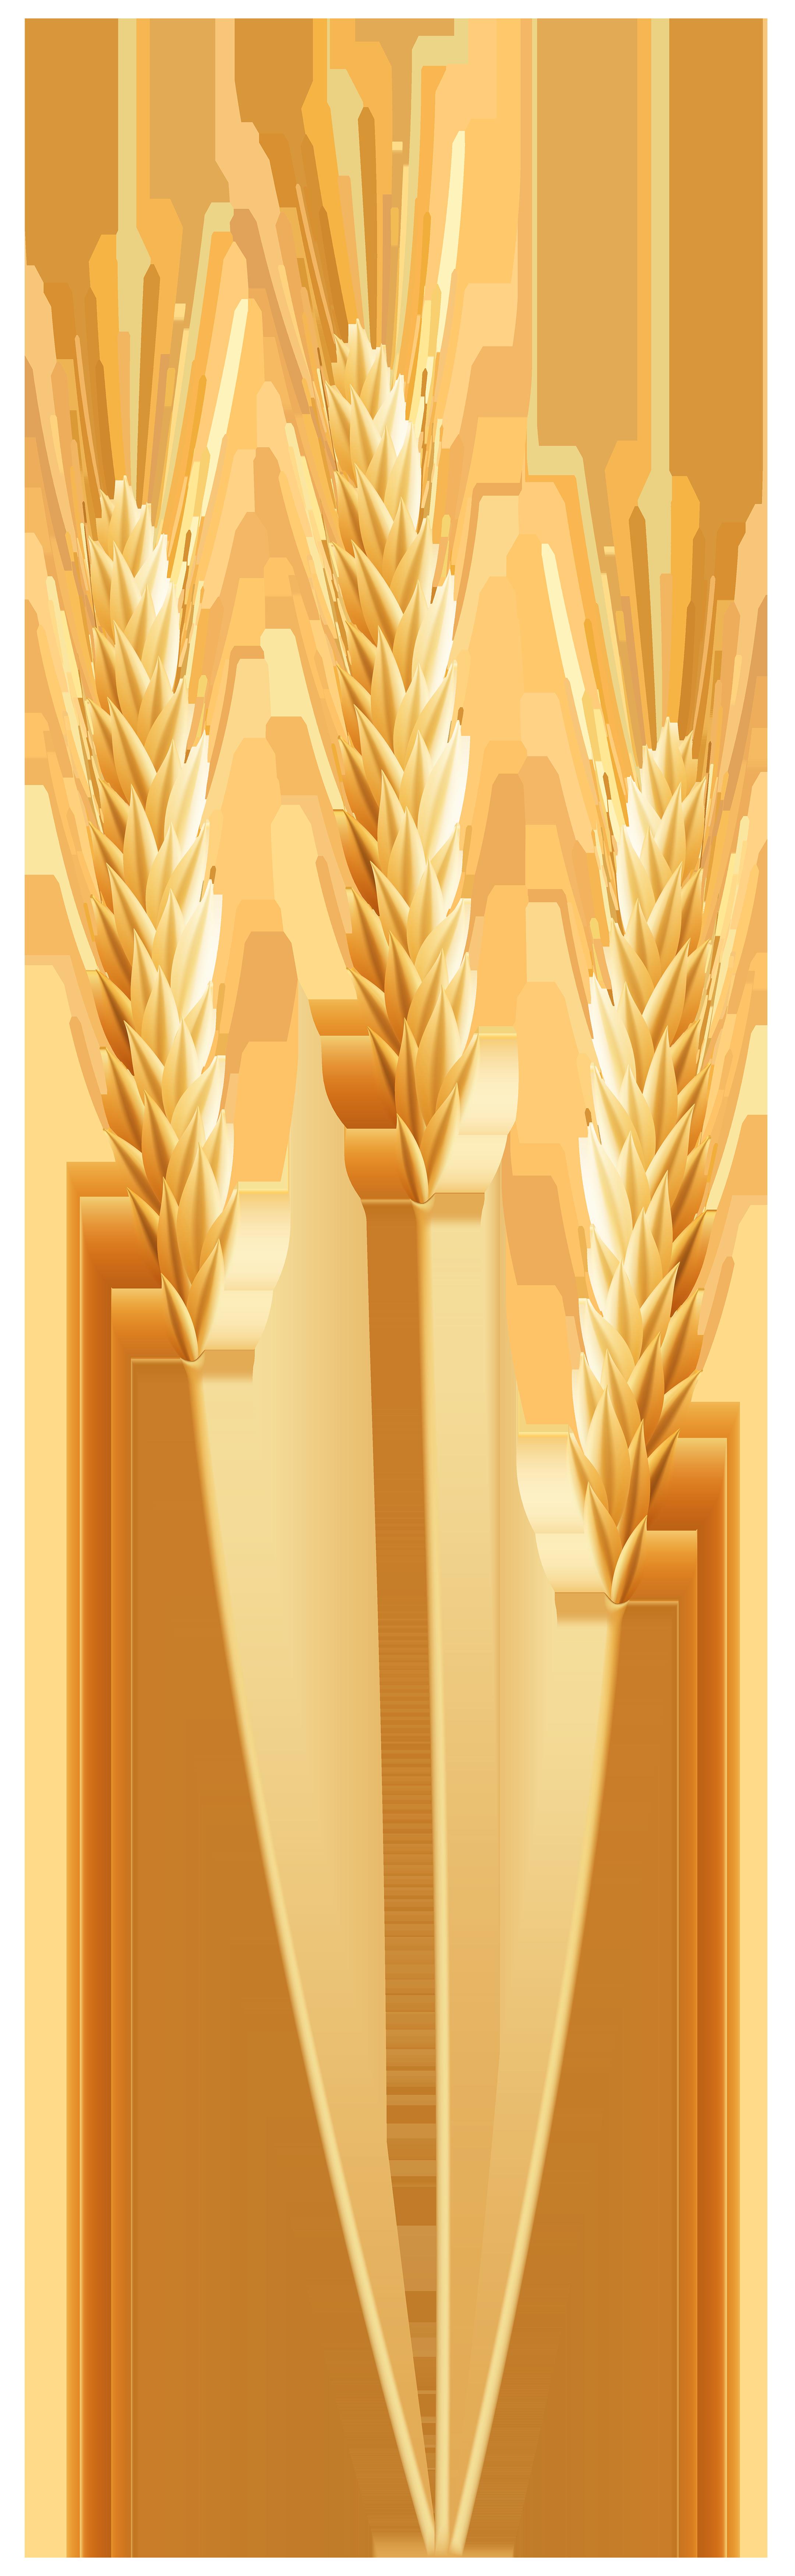 jpg free download Wheat bundle clipart. Png clip art image